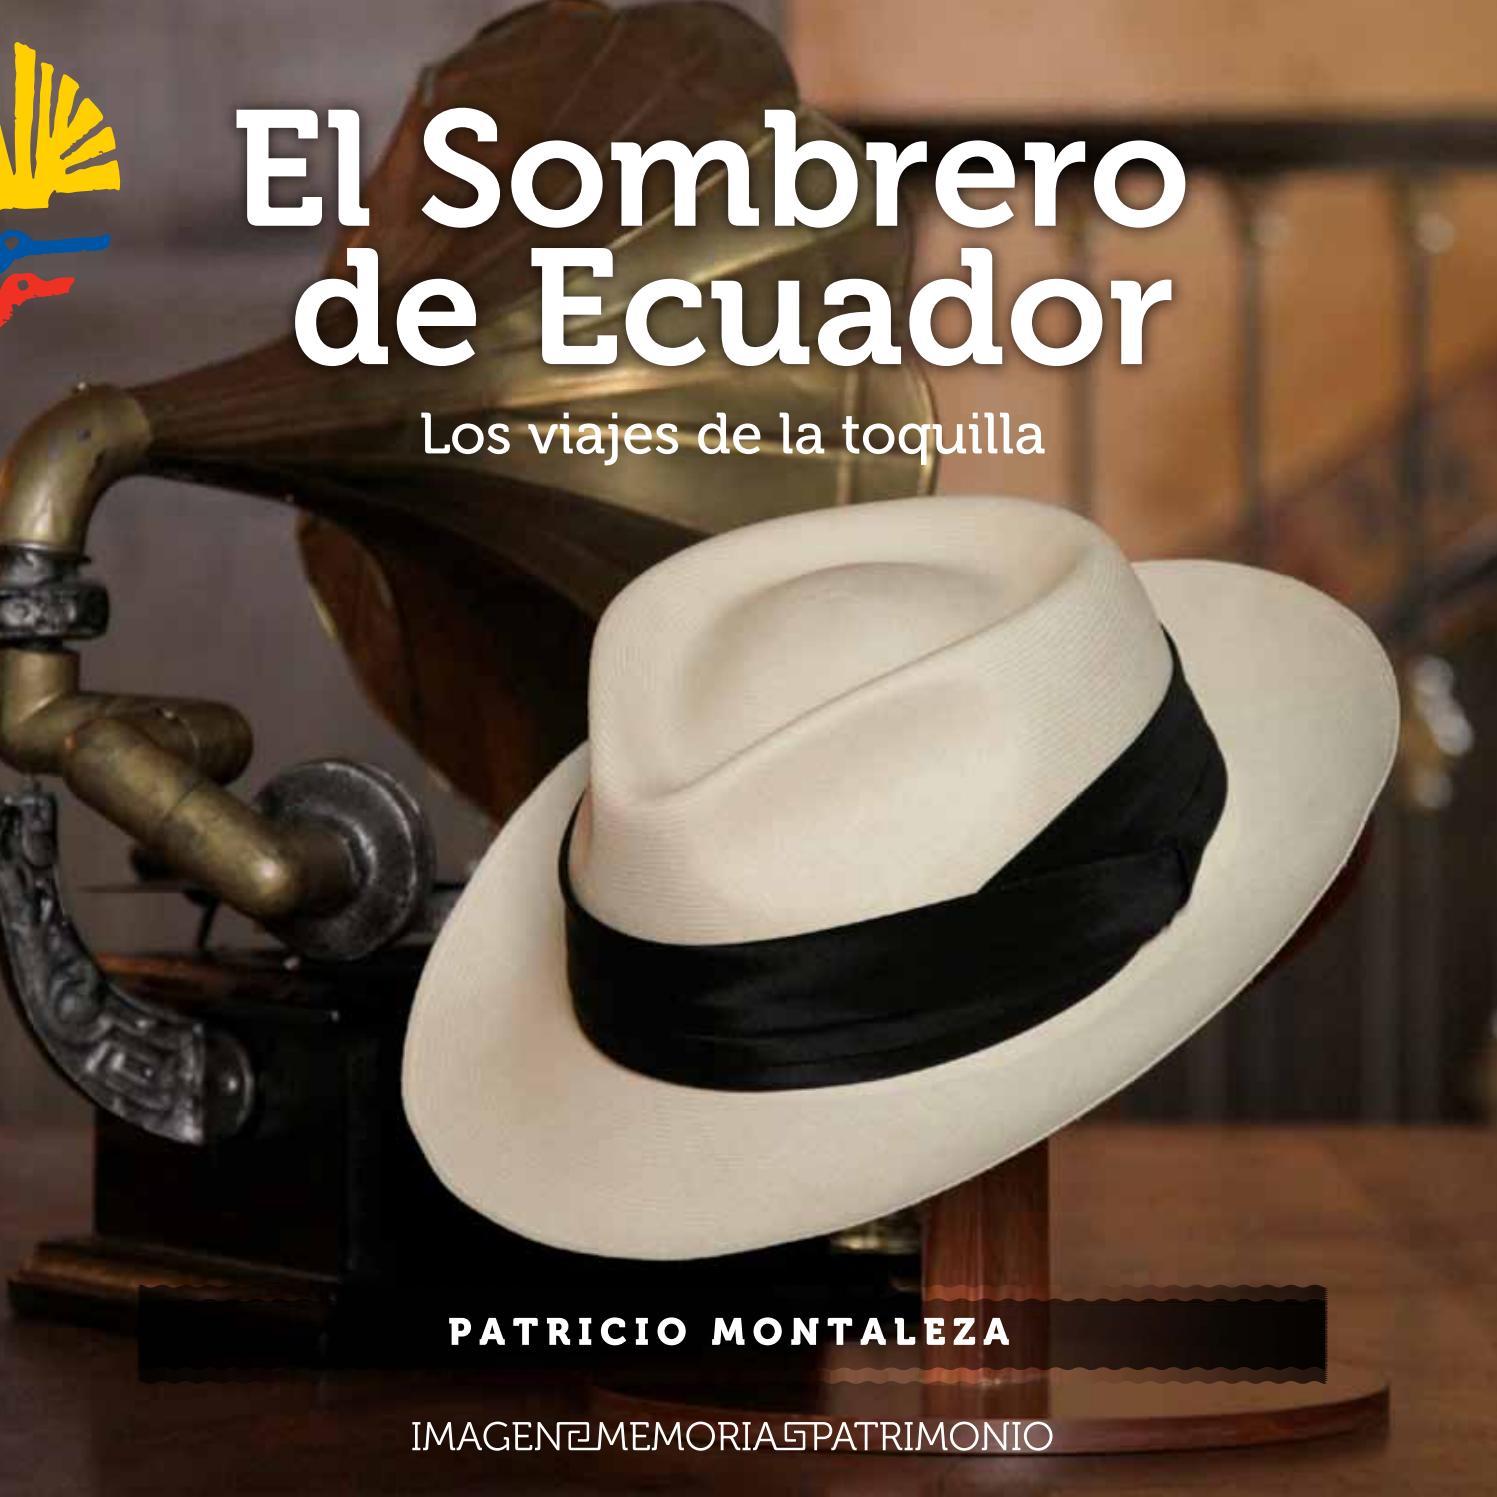 e734c87da41a1 El Sombrero del Ecuador by Fabiola Alvarez - issuu